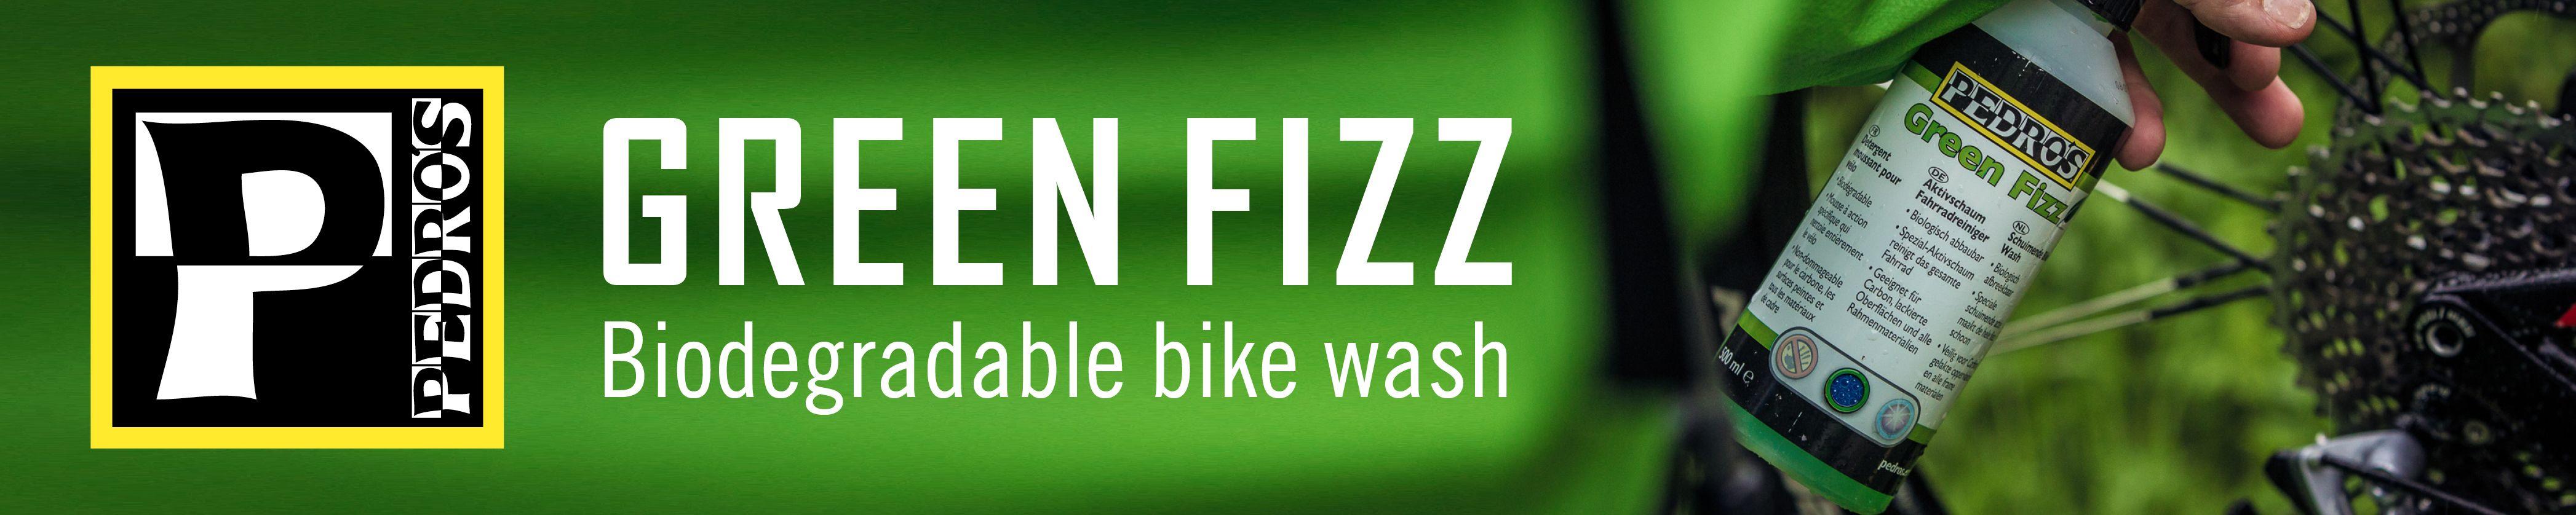 FJ – Pedros green fizz large banner